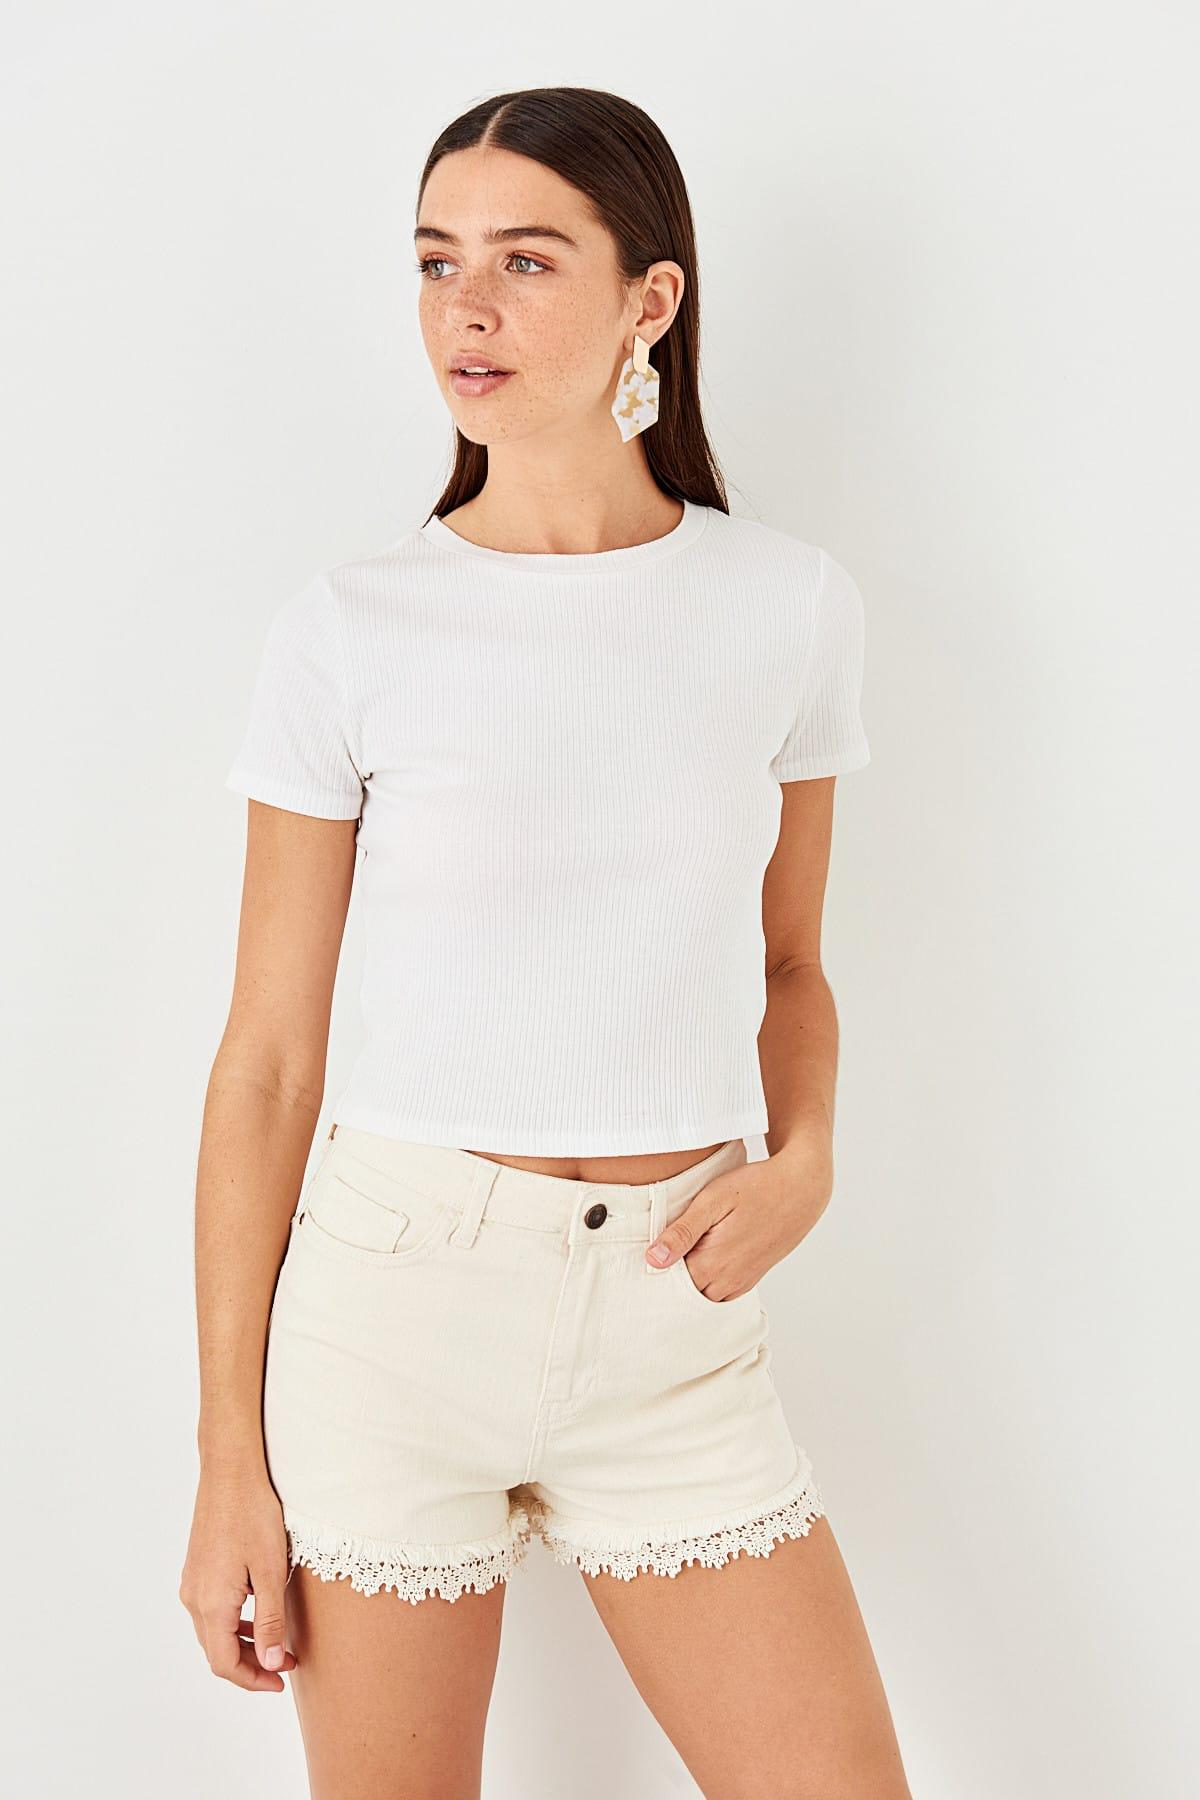 Trendyol White Pettitoes Nakış Detailed Denim Shorts TWOSS19SR0010